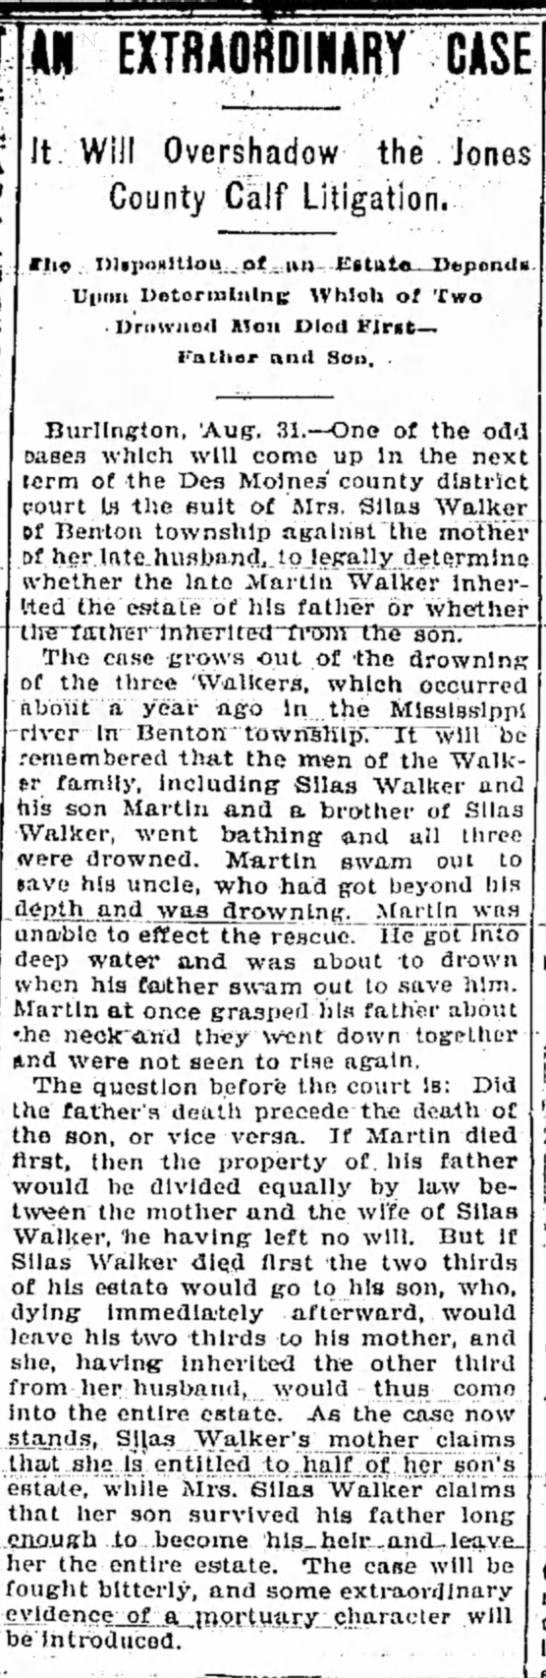 Walker Drowning Lawsuit - Hawarden Independent - 5 Sep 1895